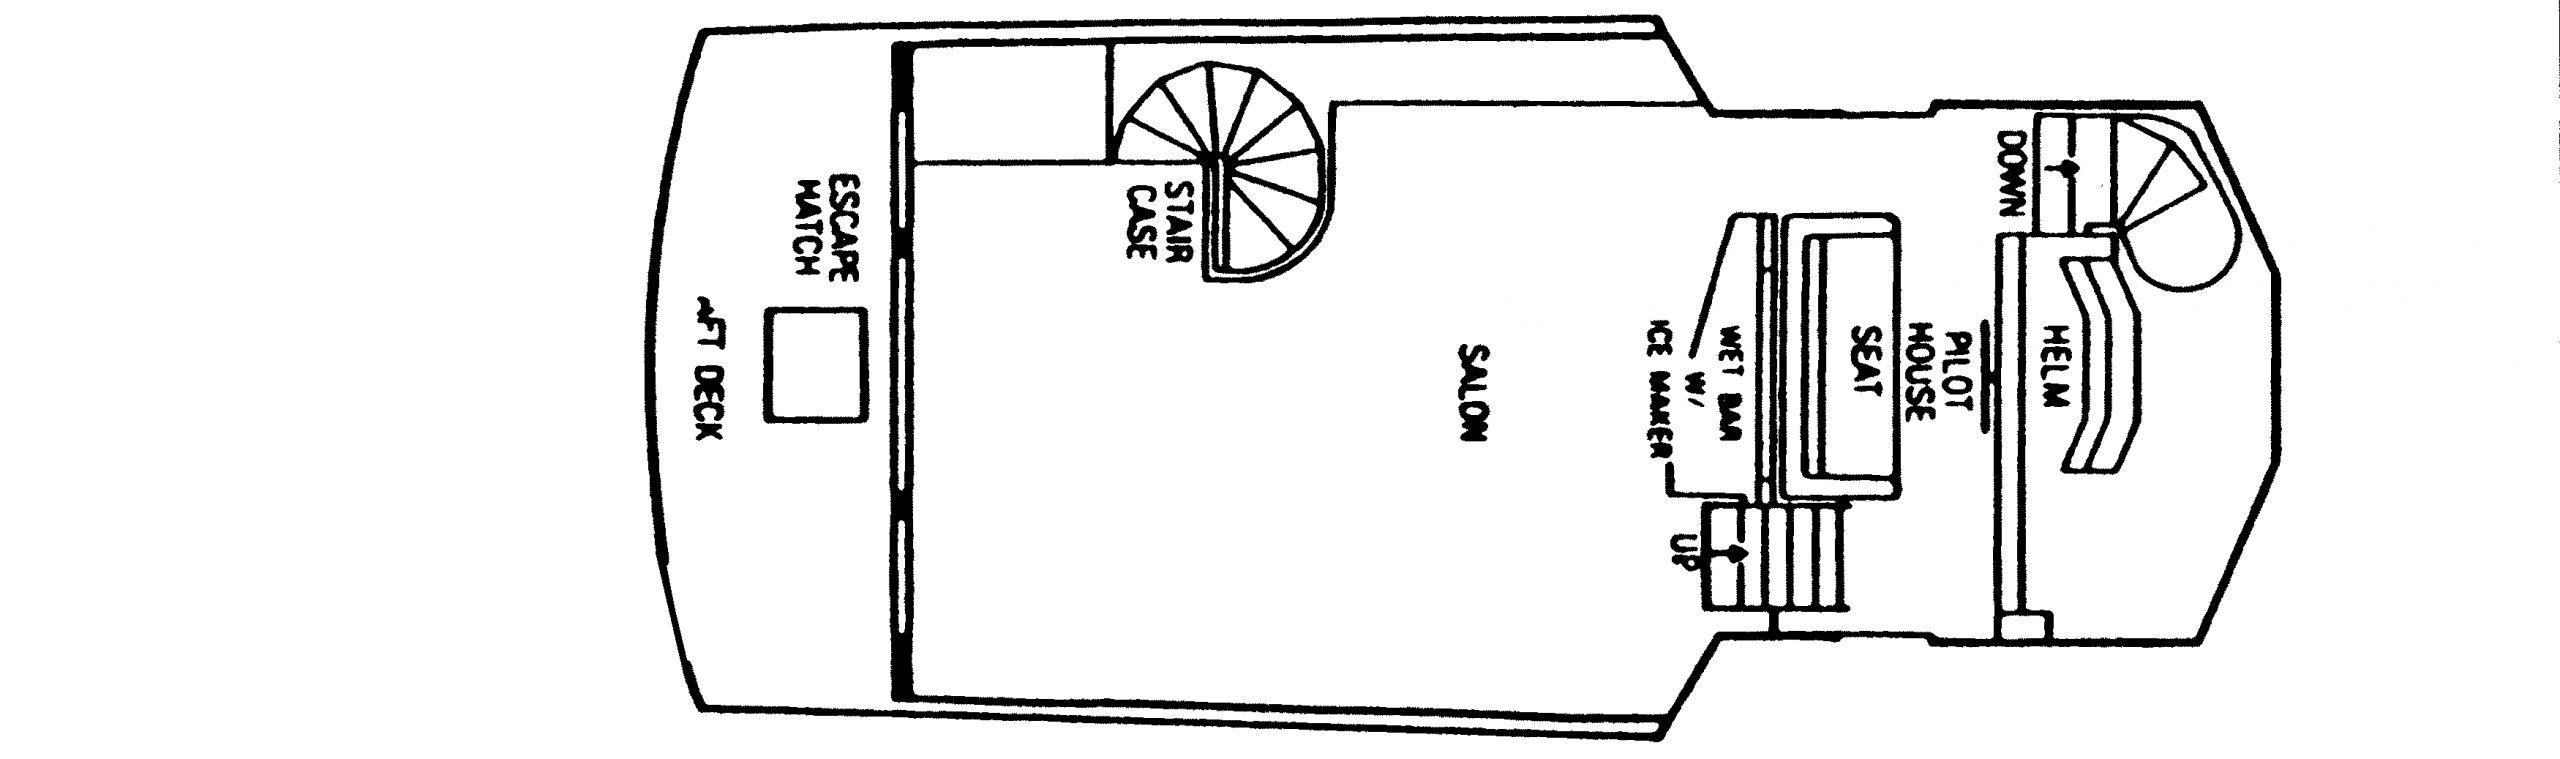 501 Motor Yacht Floor Plan 2